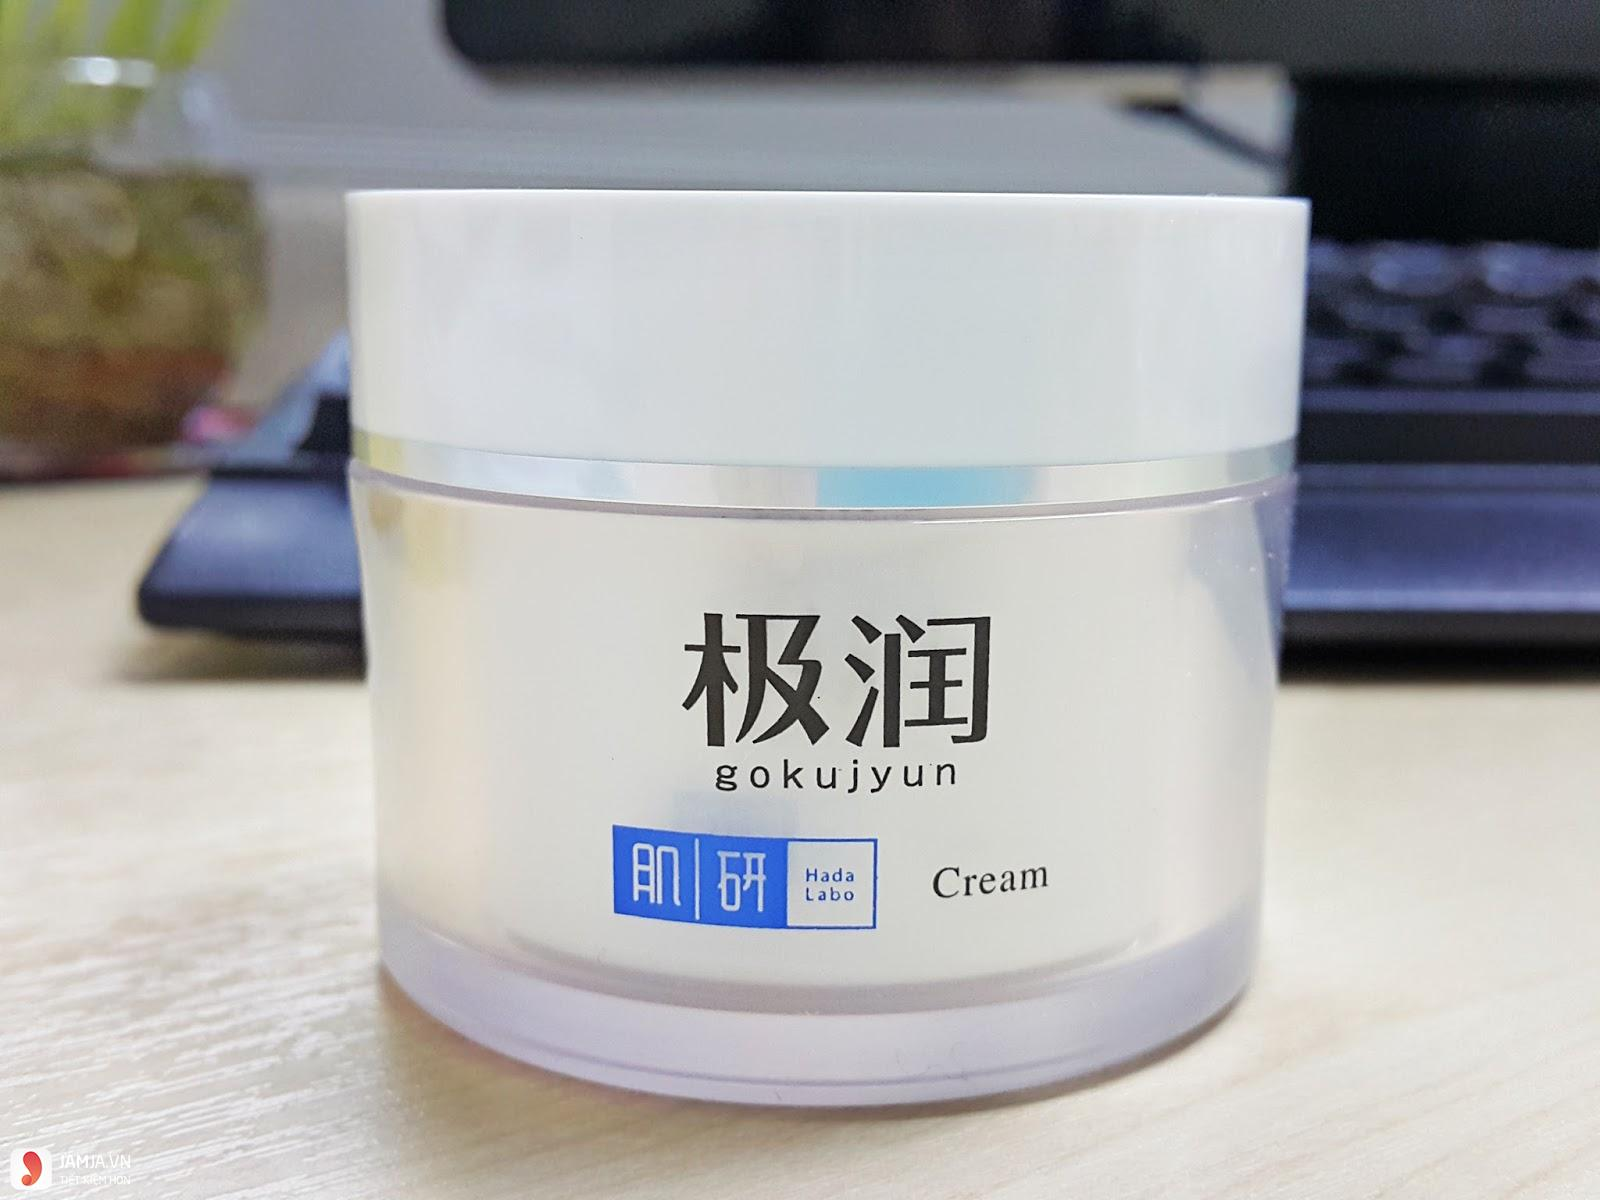 Kem dưỡng ẩm Hada Labo Gokujyun Hyaluronic A xít Moisturizing Cream